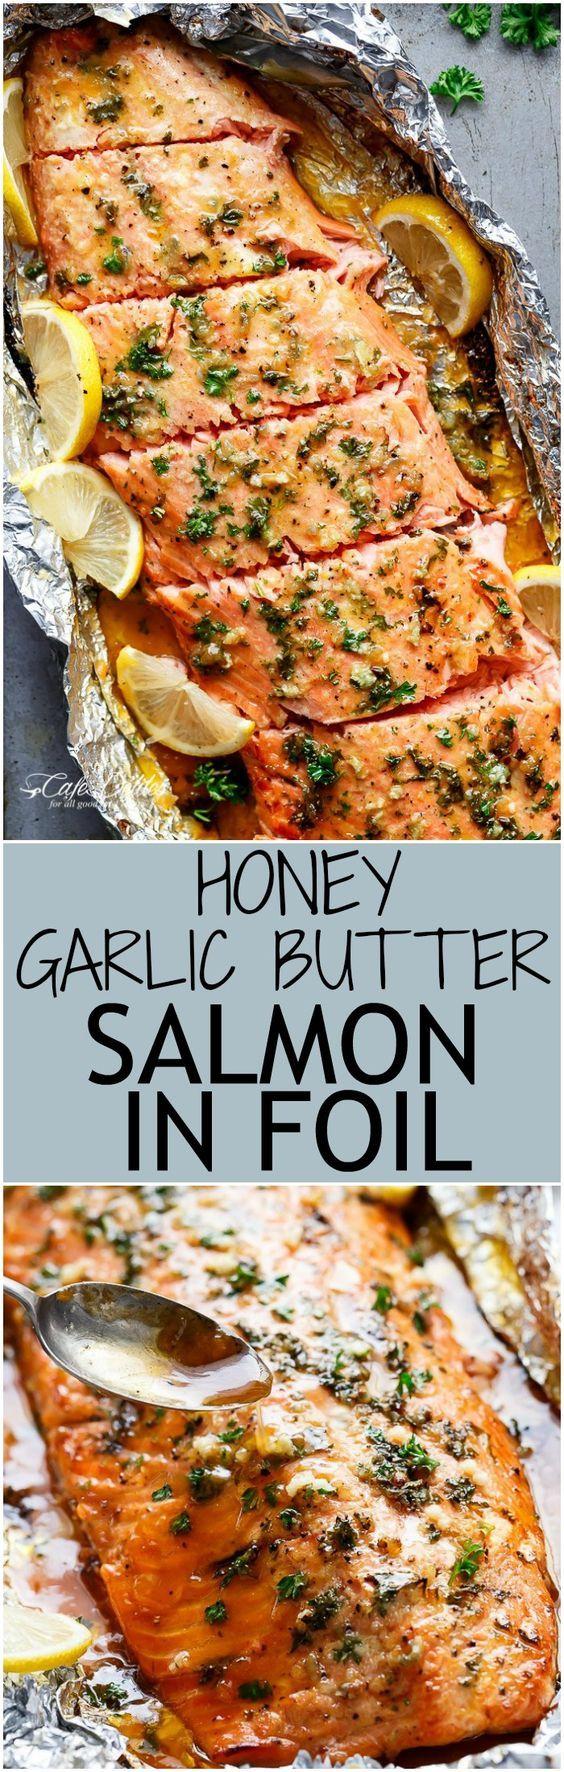 honey garlic butter salmon in foil recipe